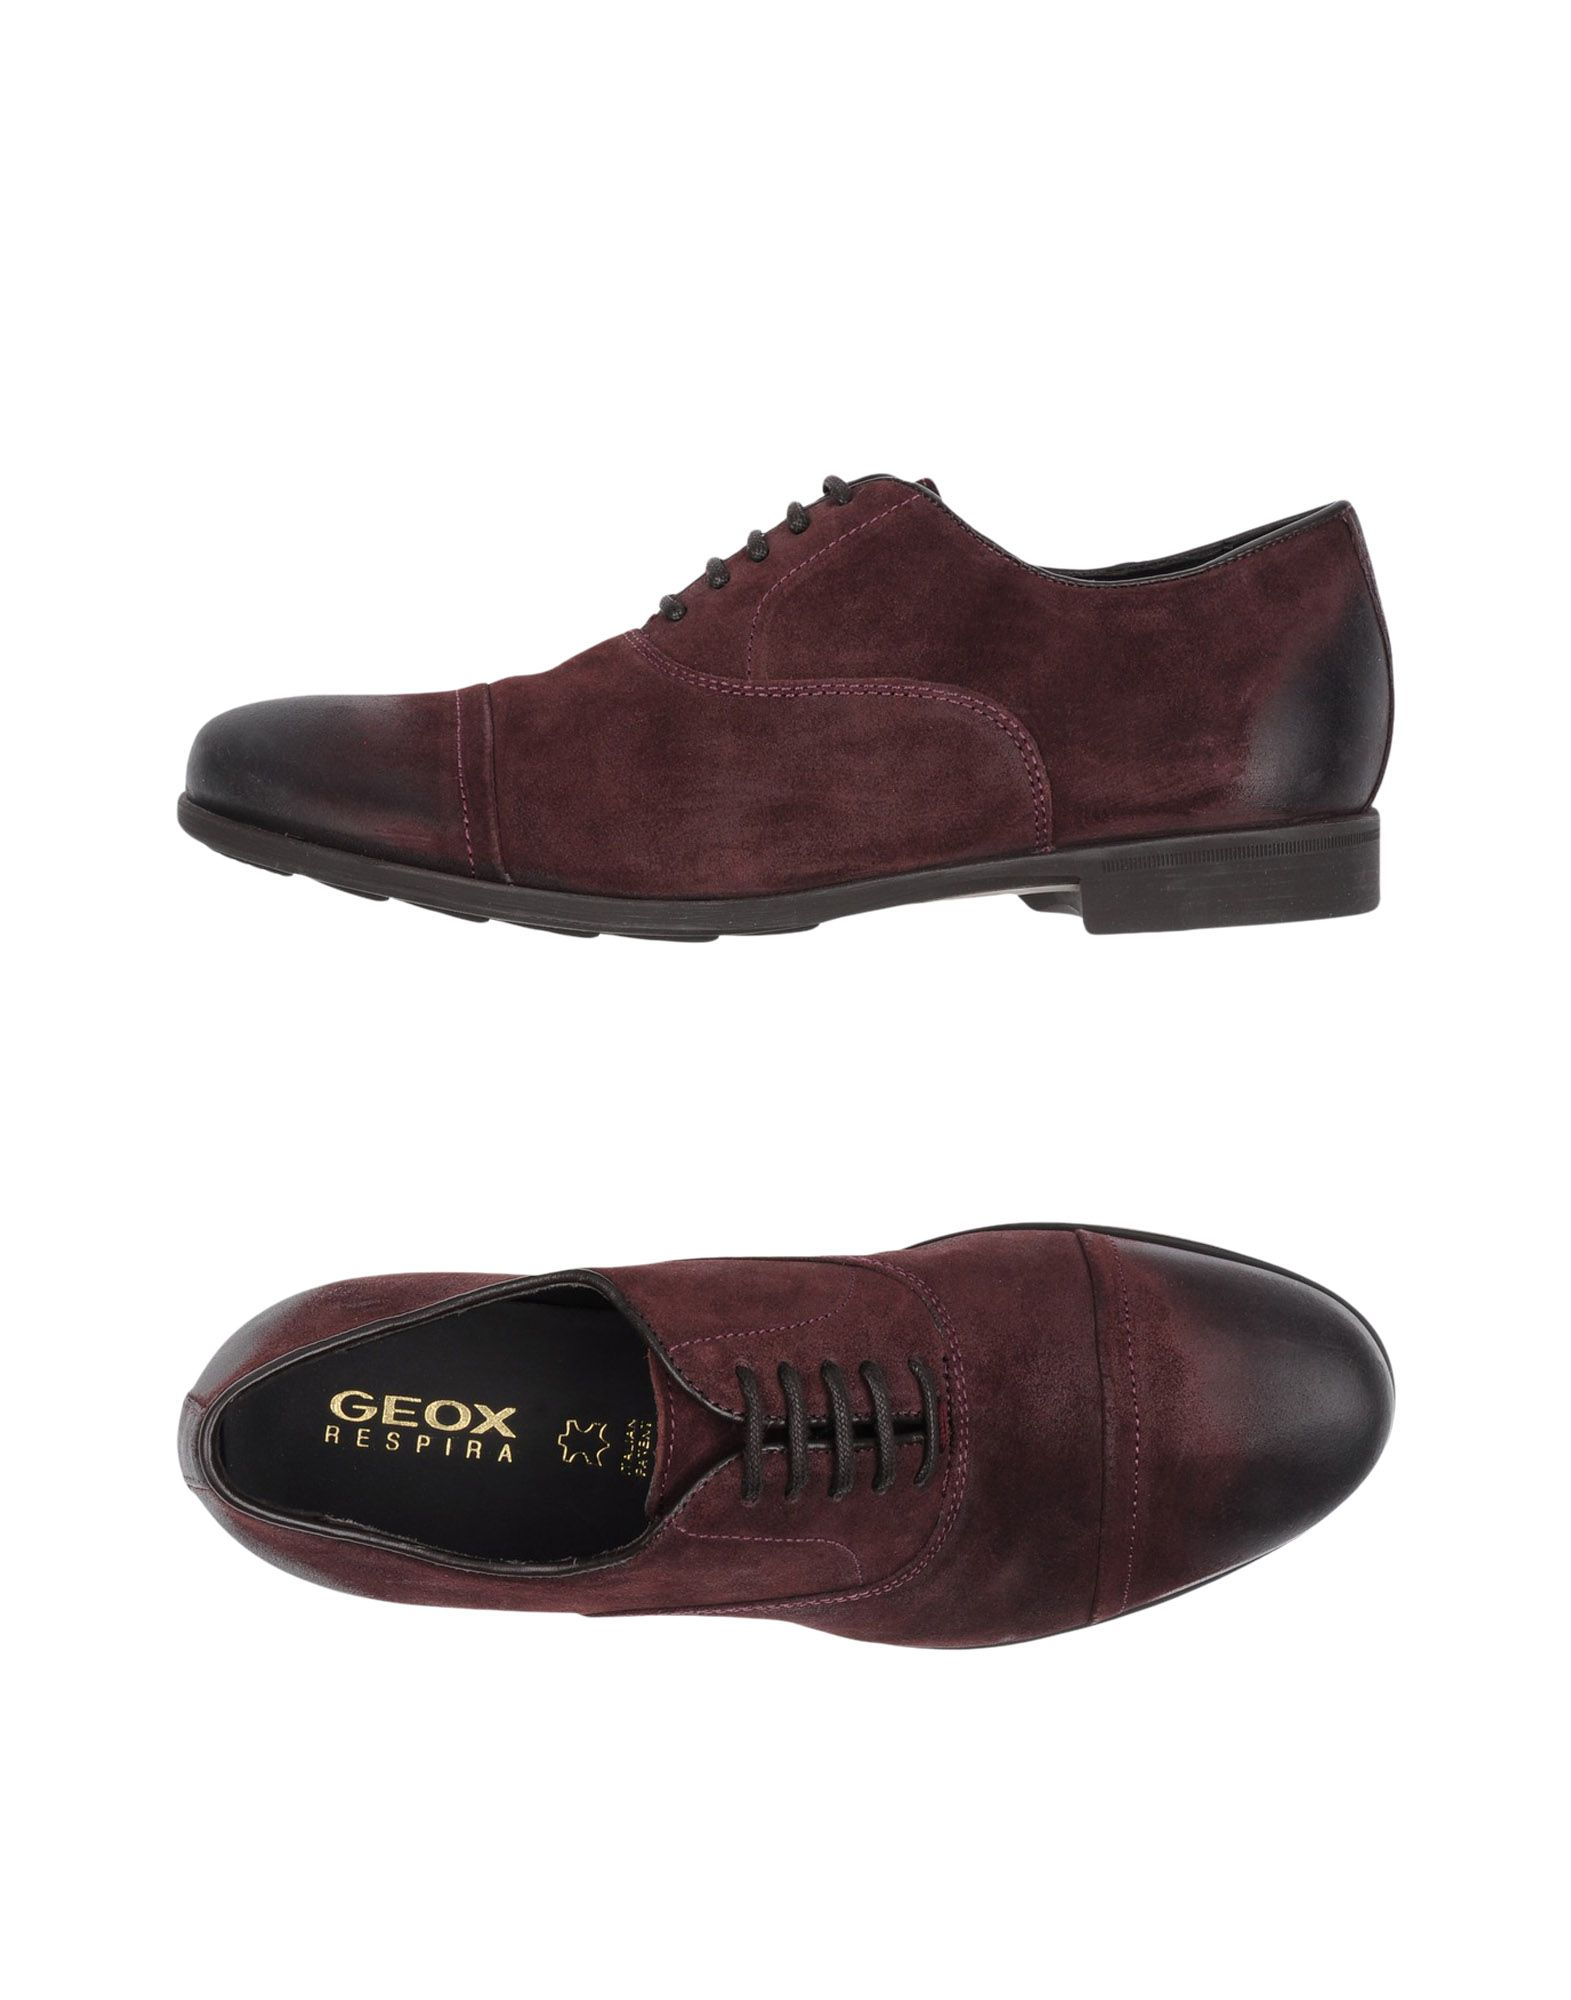 Rabatt echte Schuhe Geox Schnürschuhe Herren  11252984WV